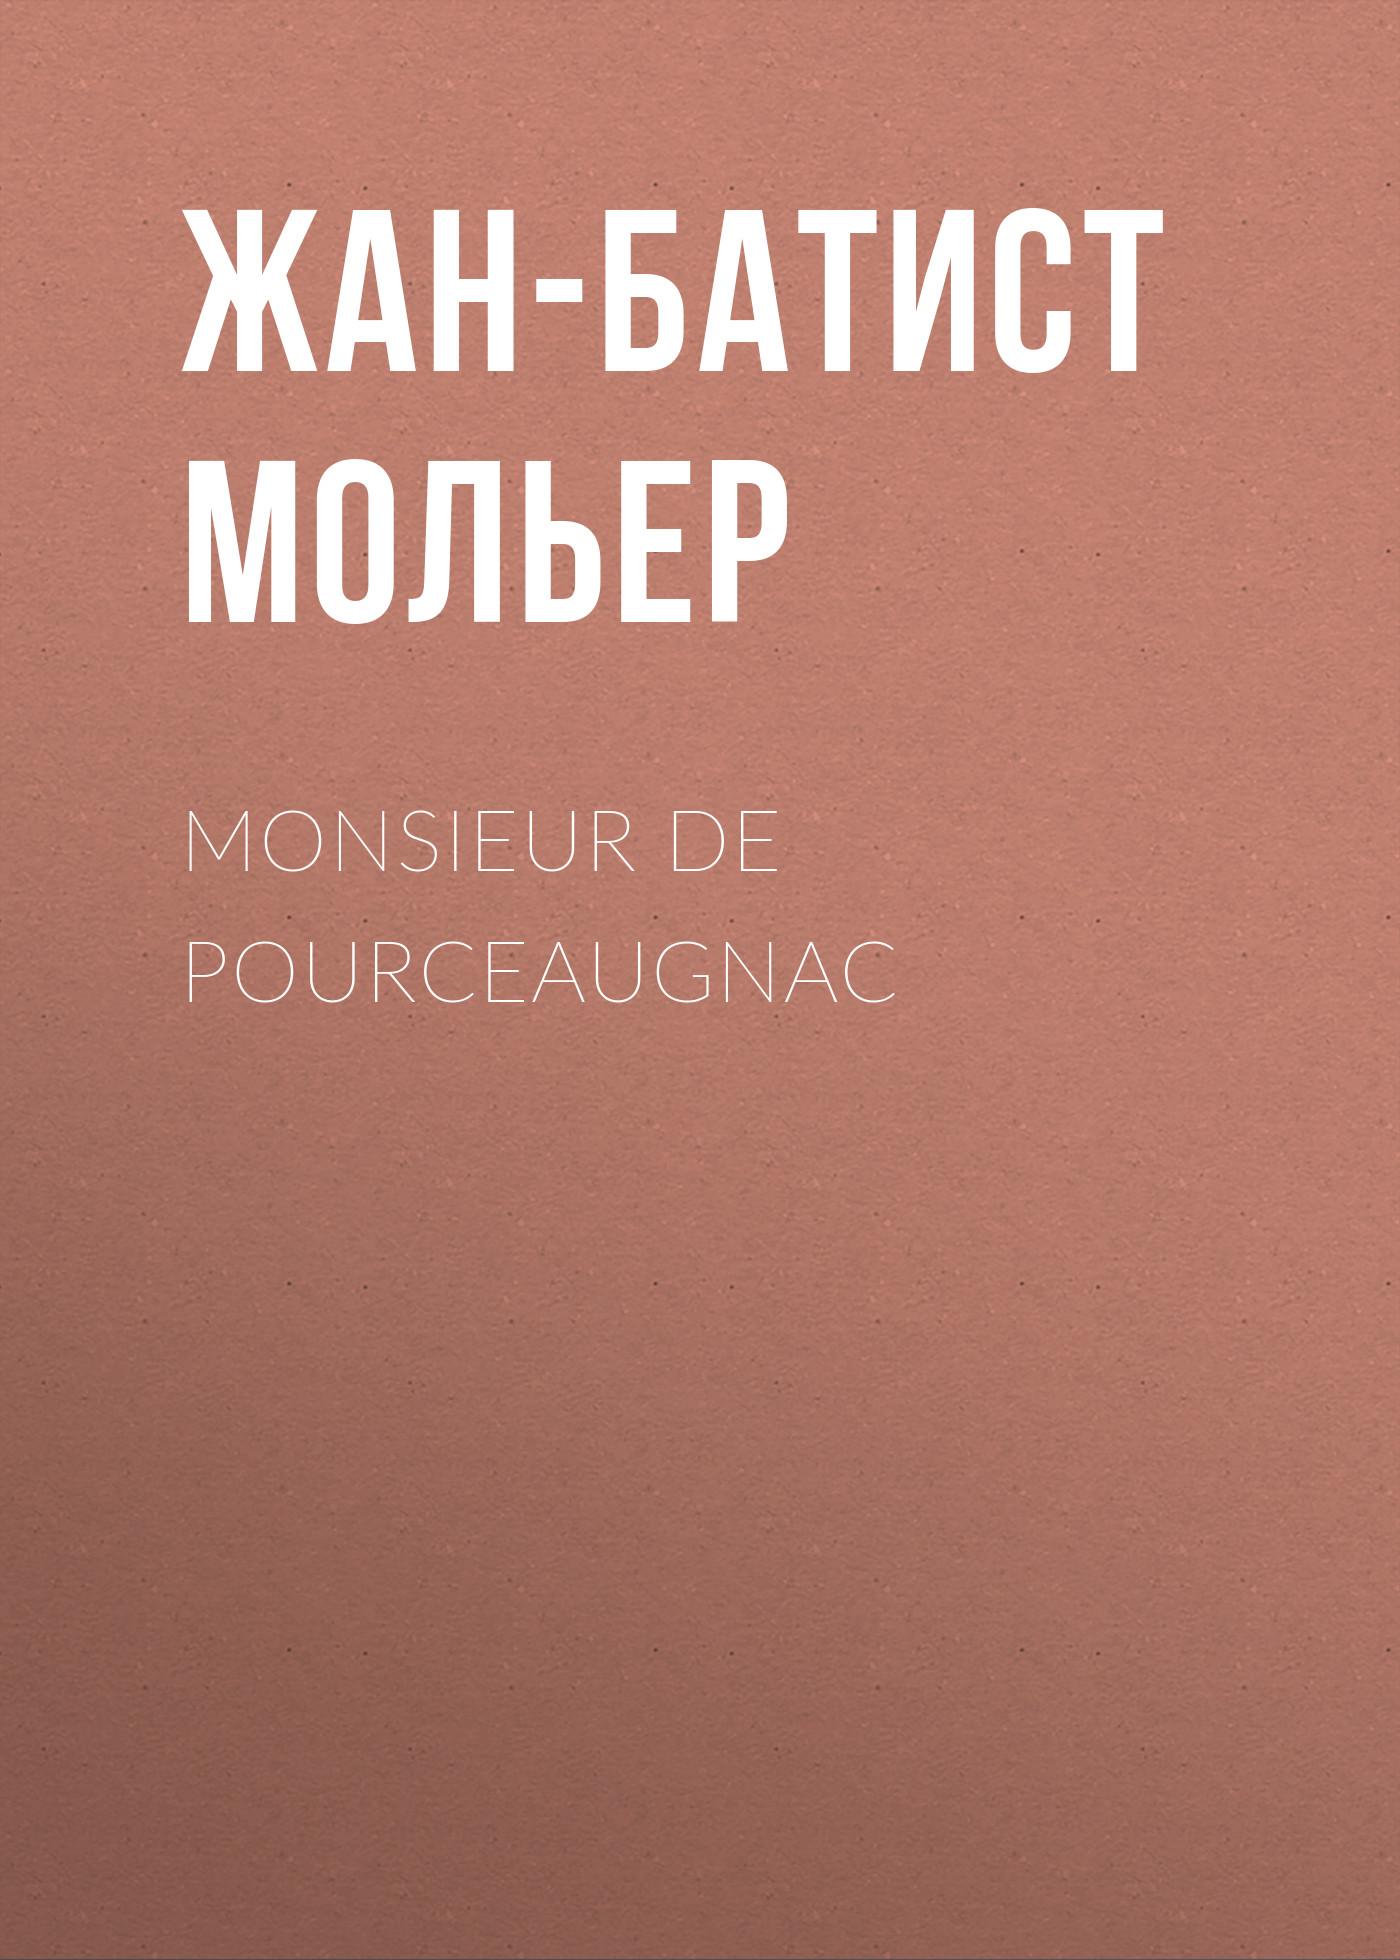 Мольер (Жан-Батист Поклен) Monsieur De Pourceaugnac жан батист мольер lääkäri vastoin tahtoansa